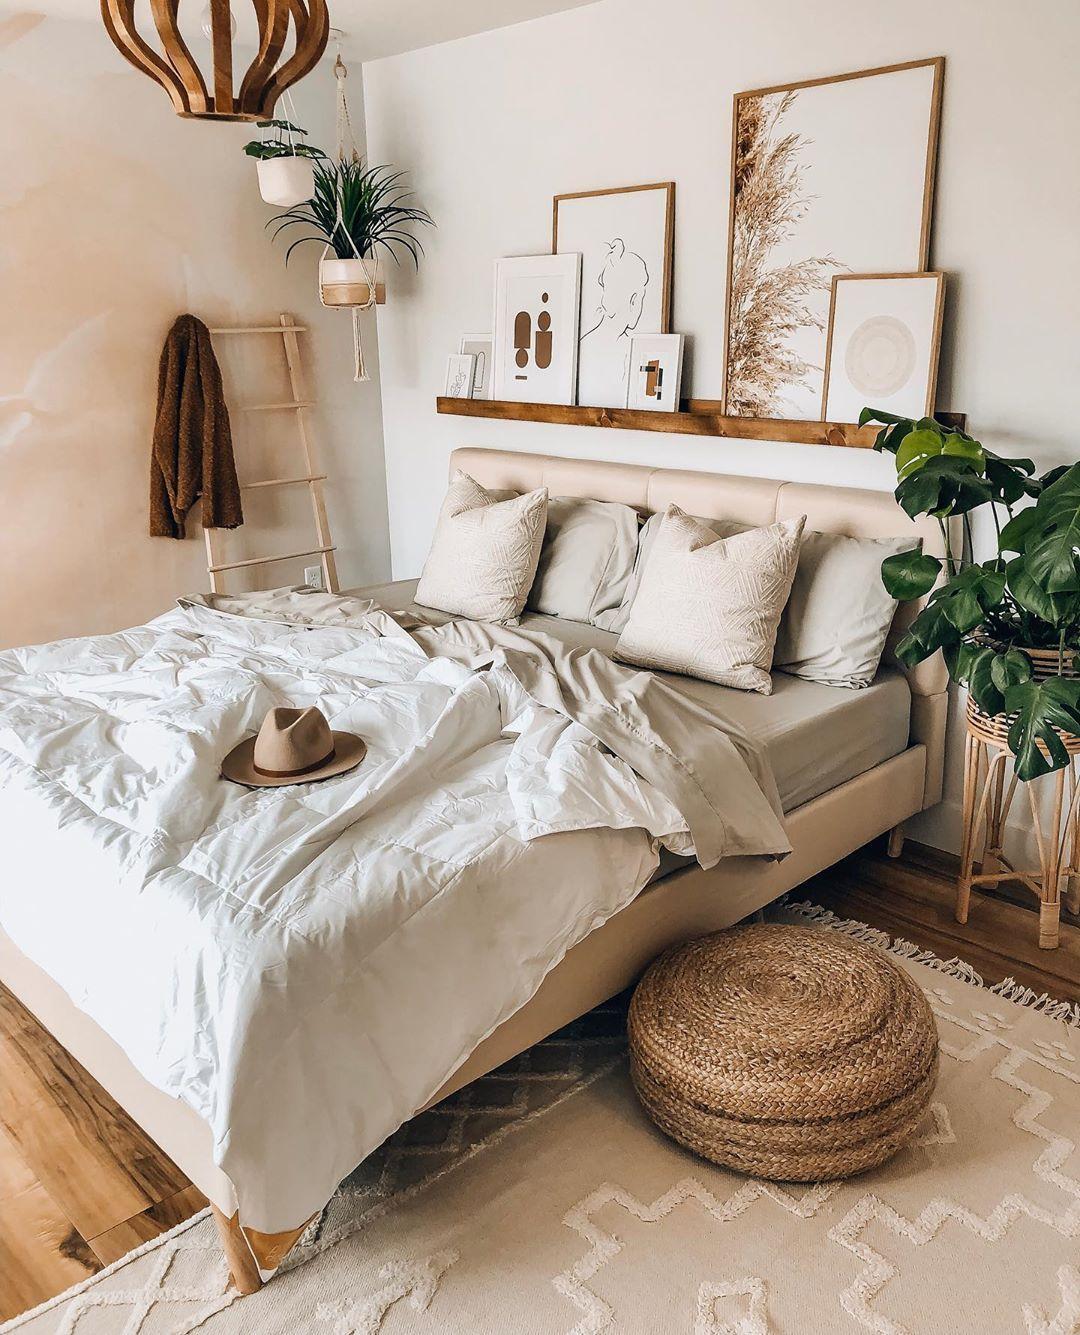 PUREDOWN White Goose Down Comforter, Lightweight Duvet Insert or Stand-Alone Comforter 300 TC, White